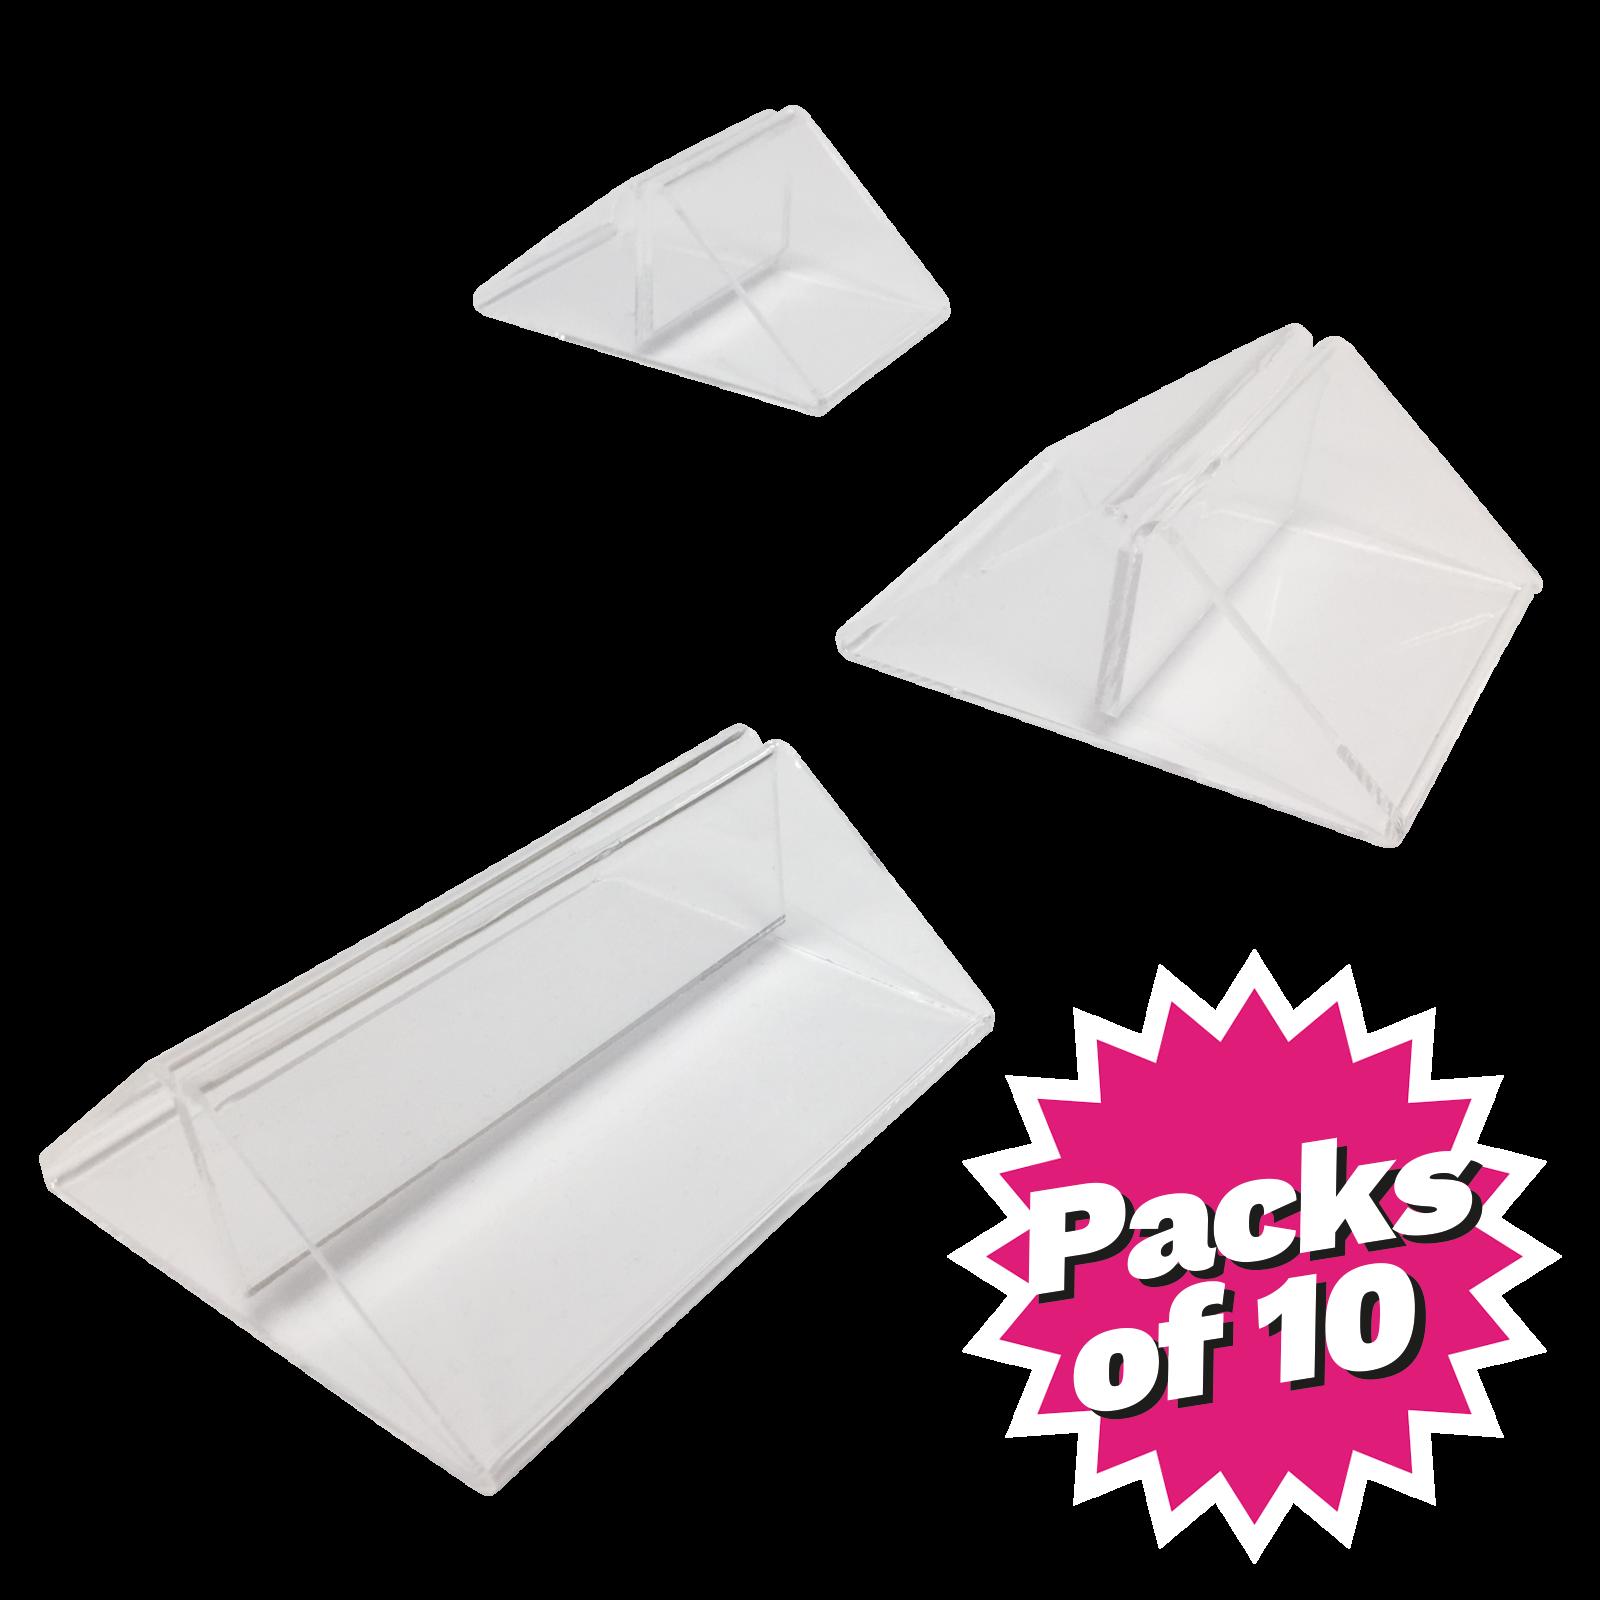 Acrylic Menu Card Holders - Pack of 10